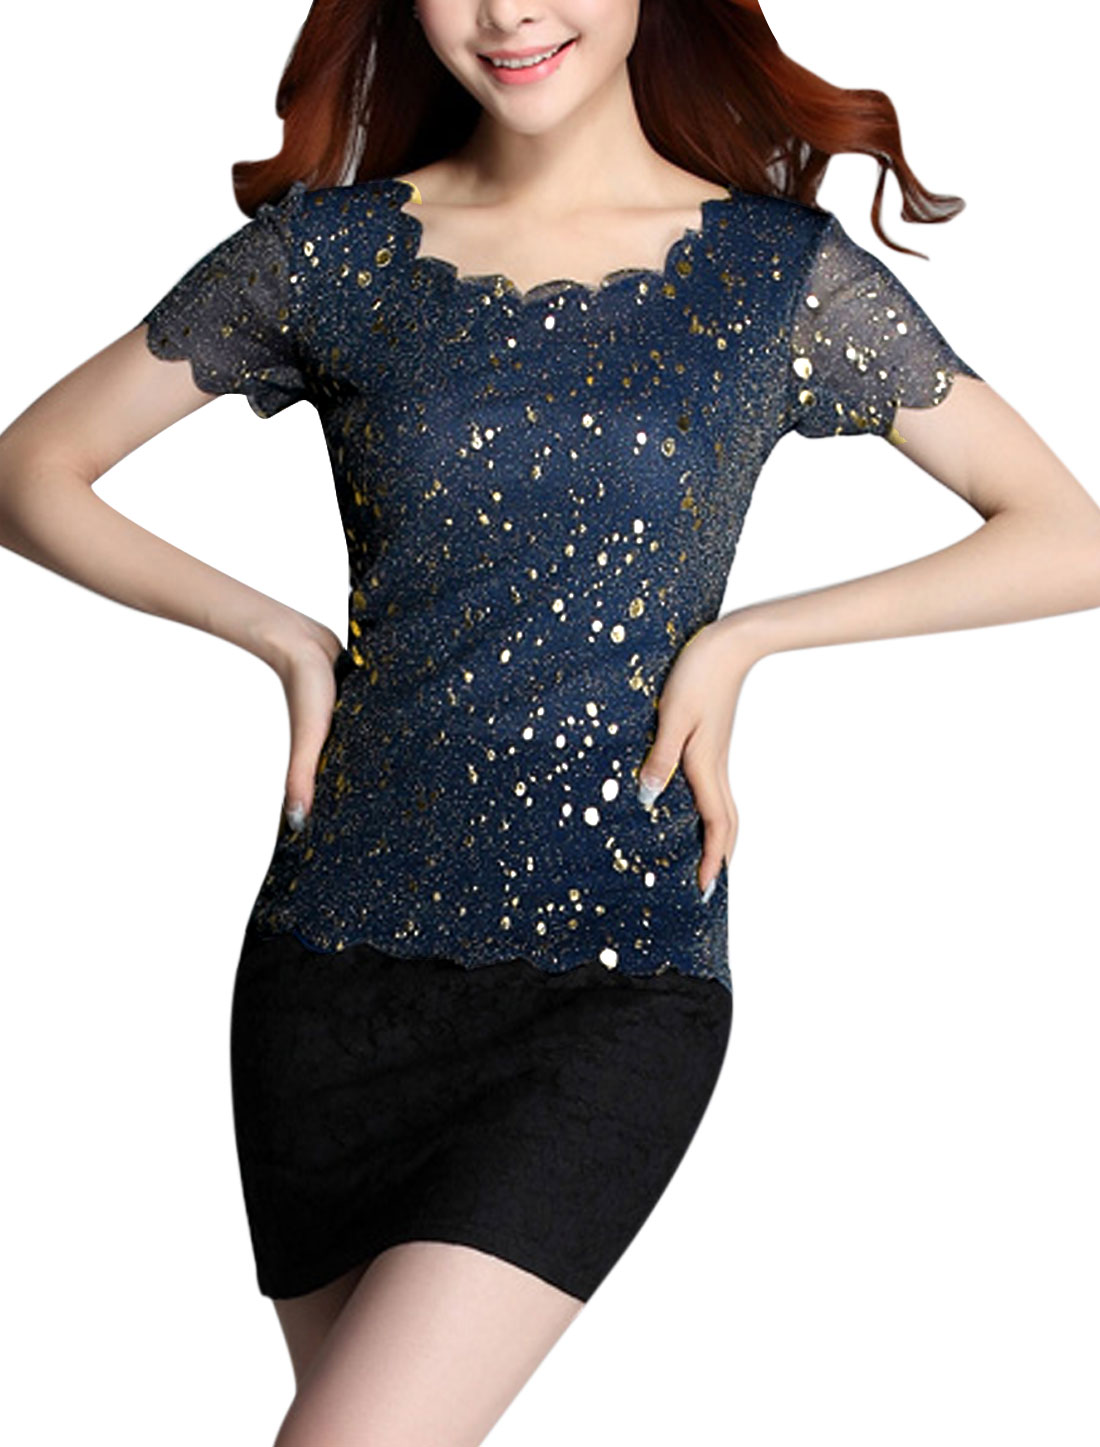 Lady Layered Mesh Paint Prints Elastic Shiny Summer T-Shirt Dark Blue S